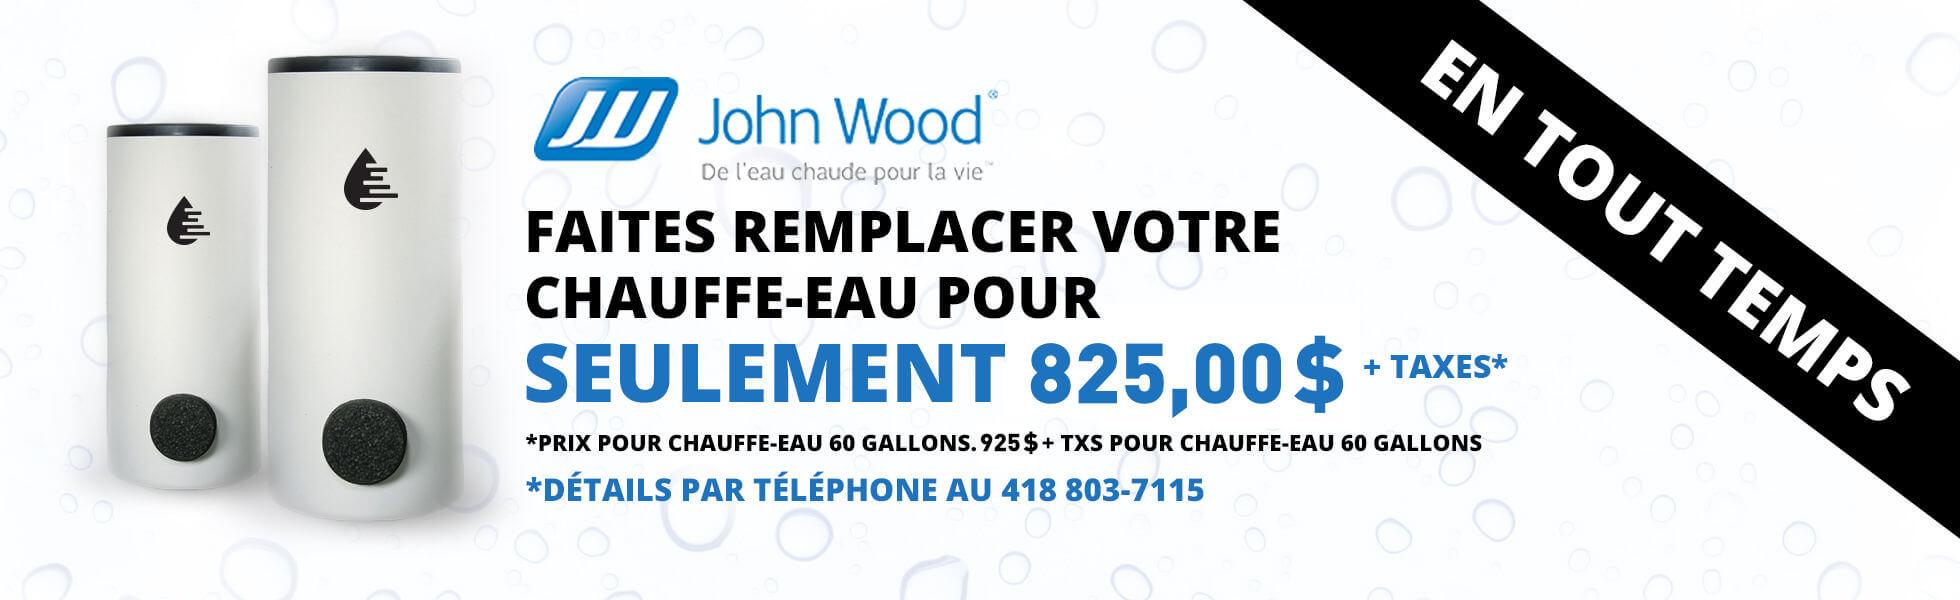 Chauffe-eau-permanent-plomberie-quessy-2021